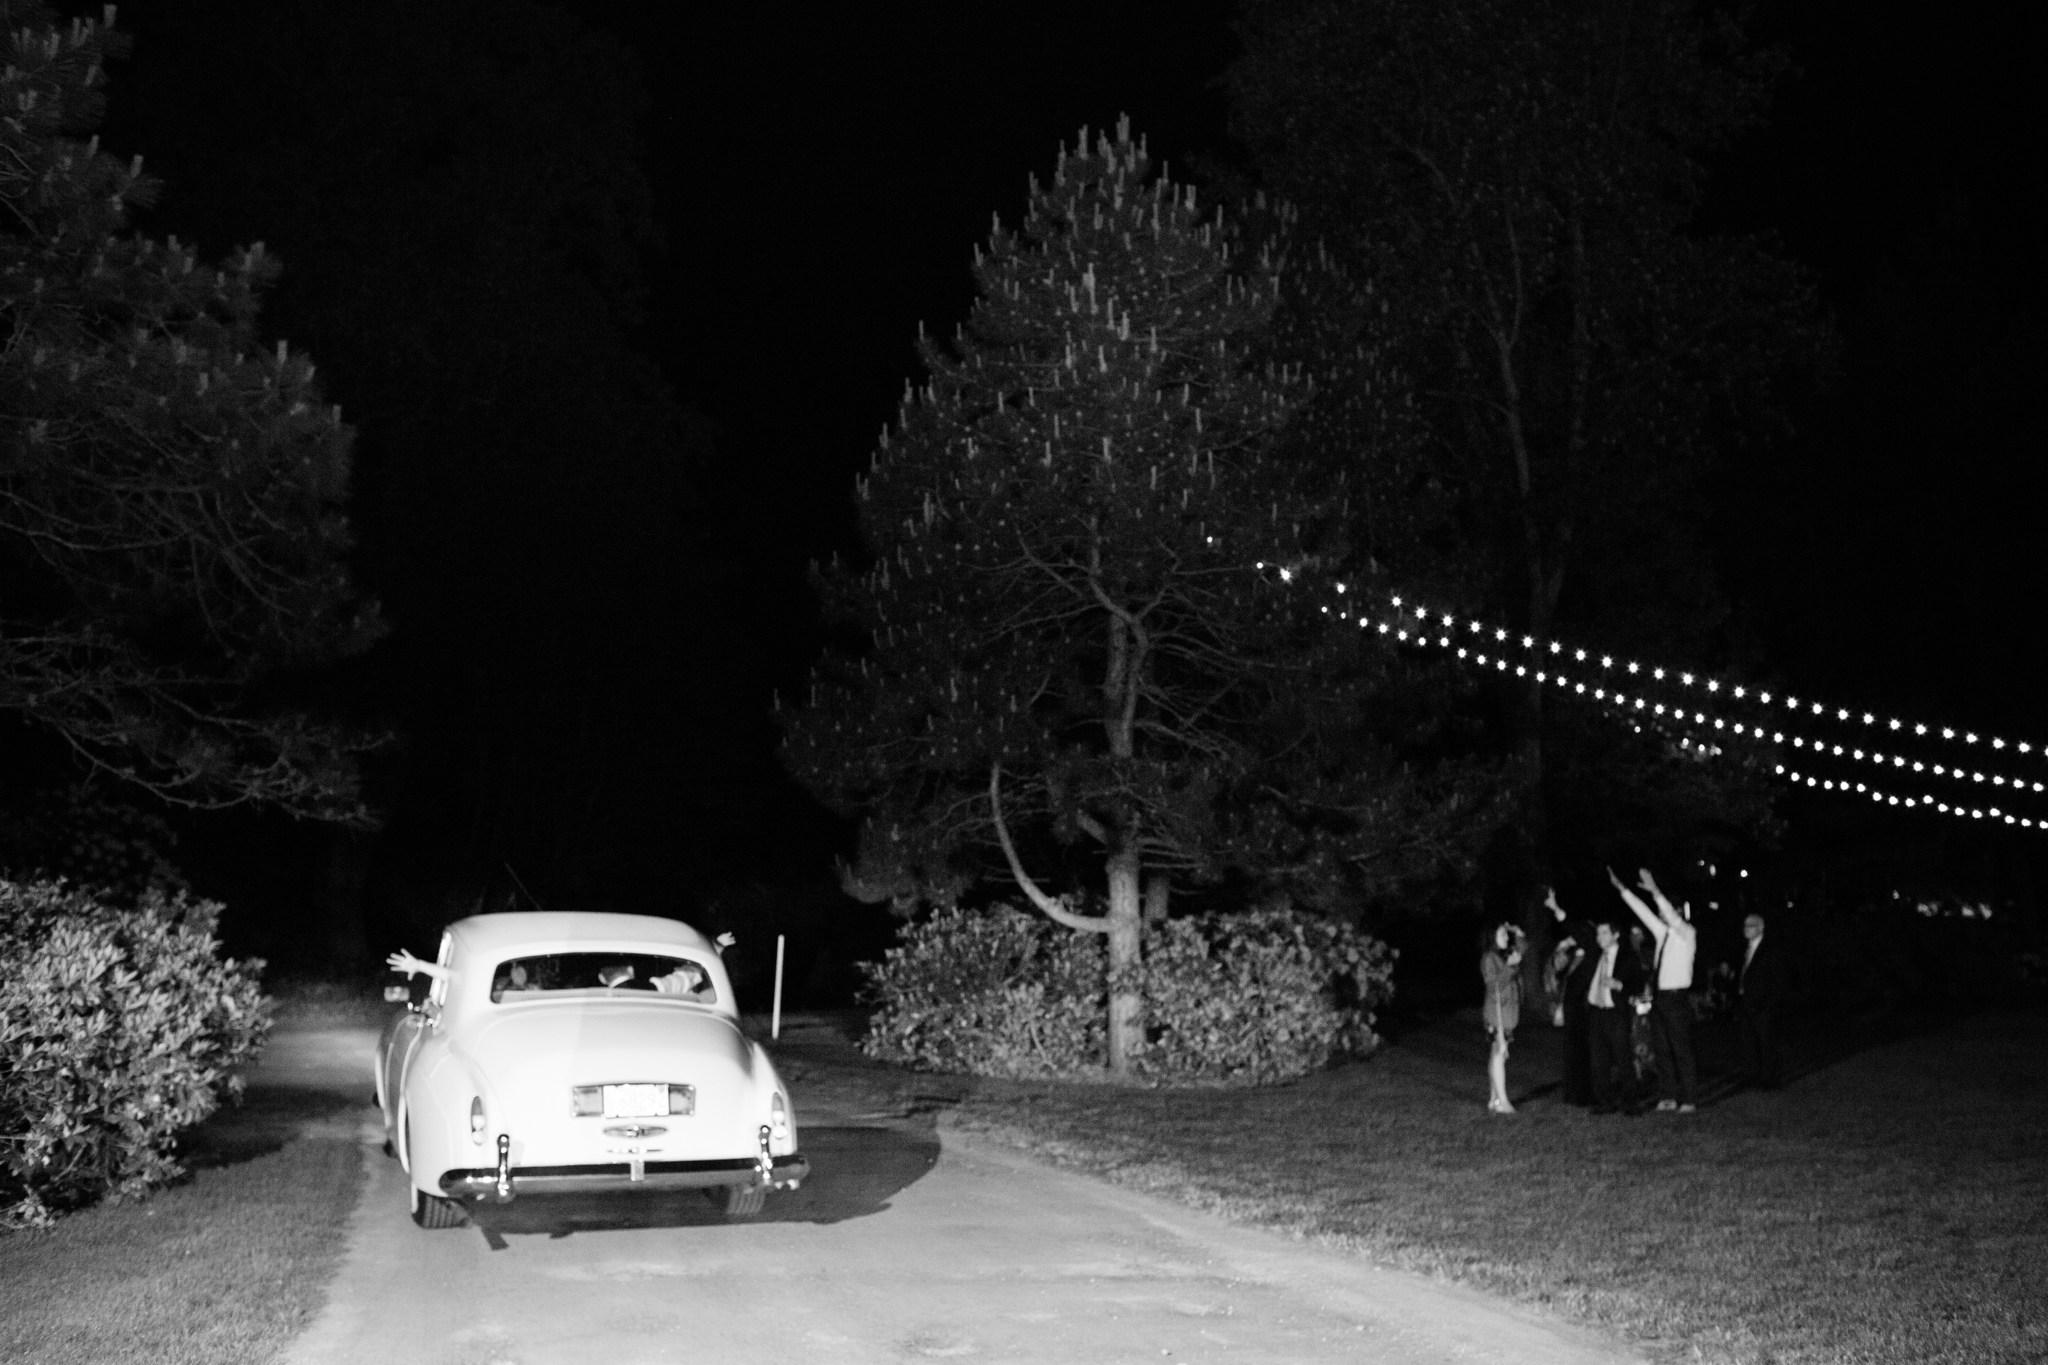 estate_moraine_farm_wedding_photos_deborah_zoe_00148.JPG